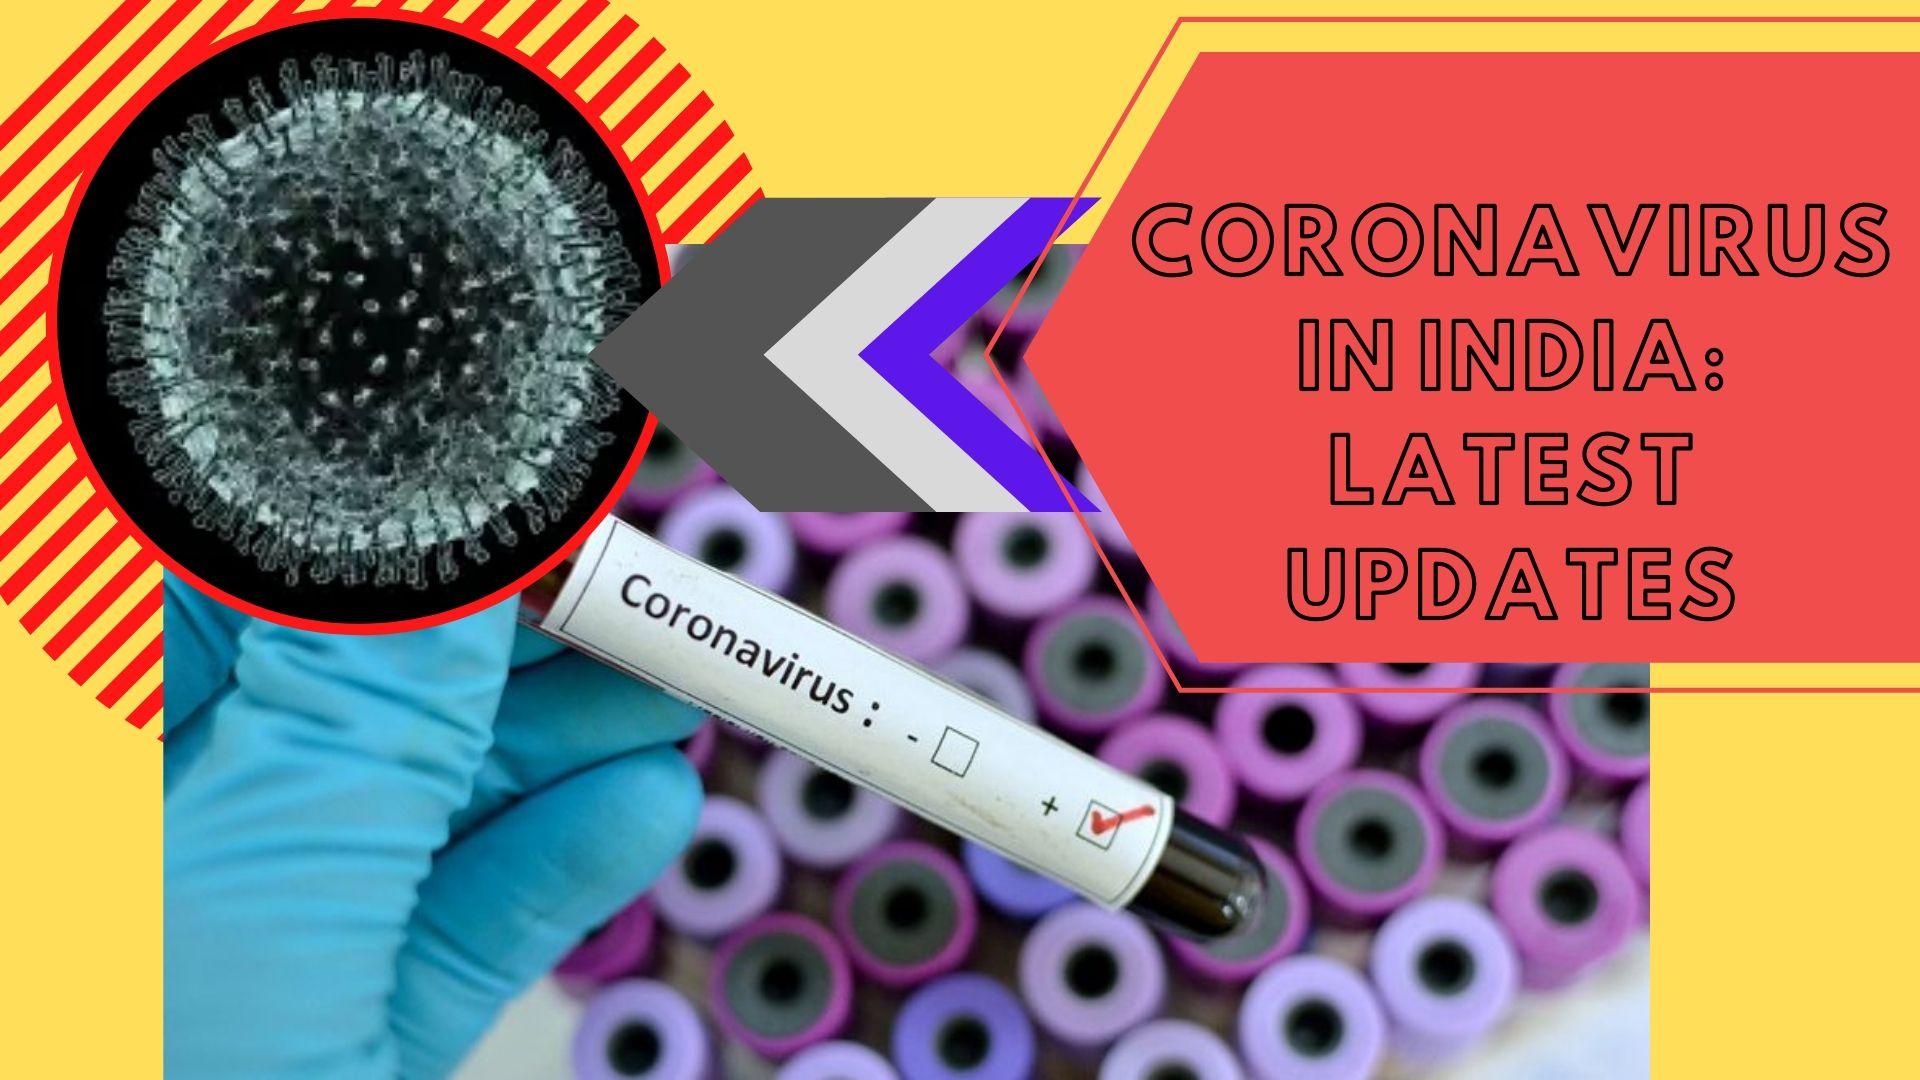 CORONAVIRUS IN INDIA: LATEST UPDATES